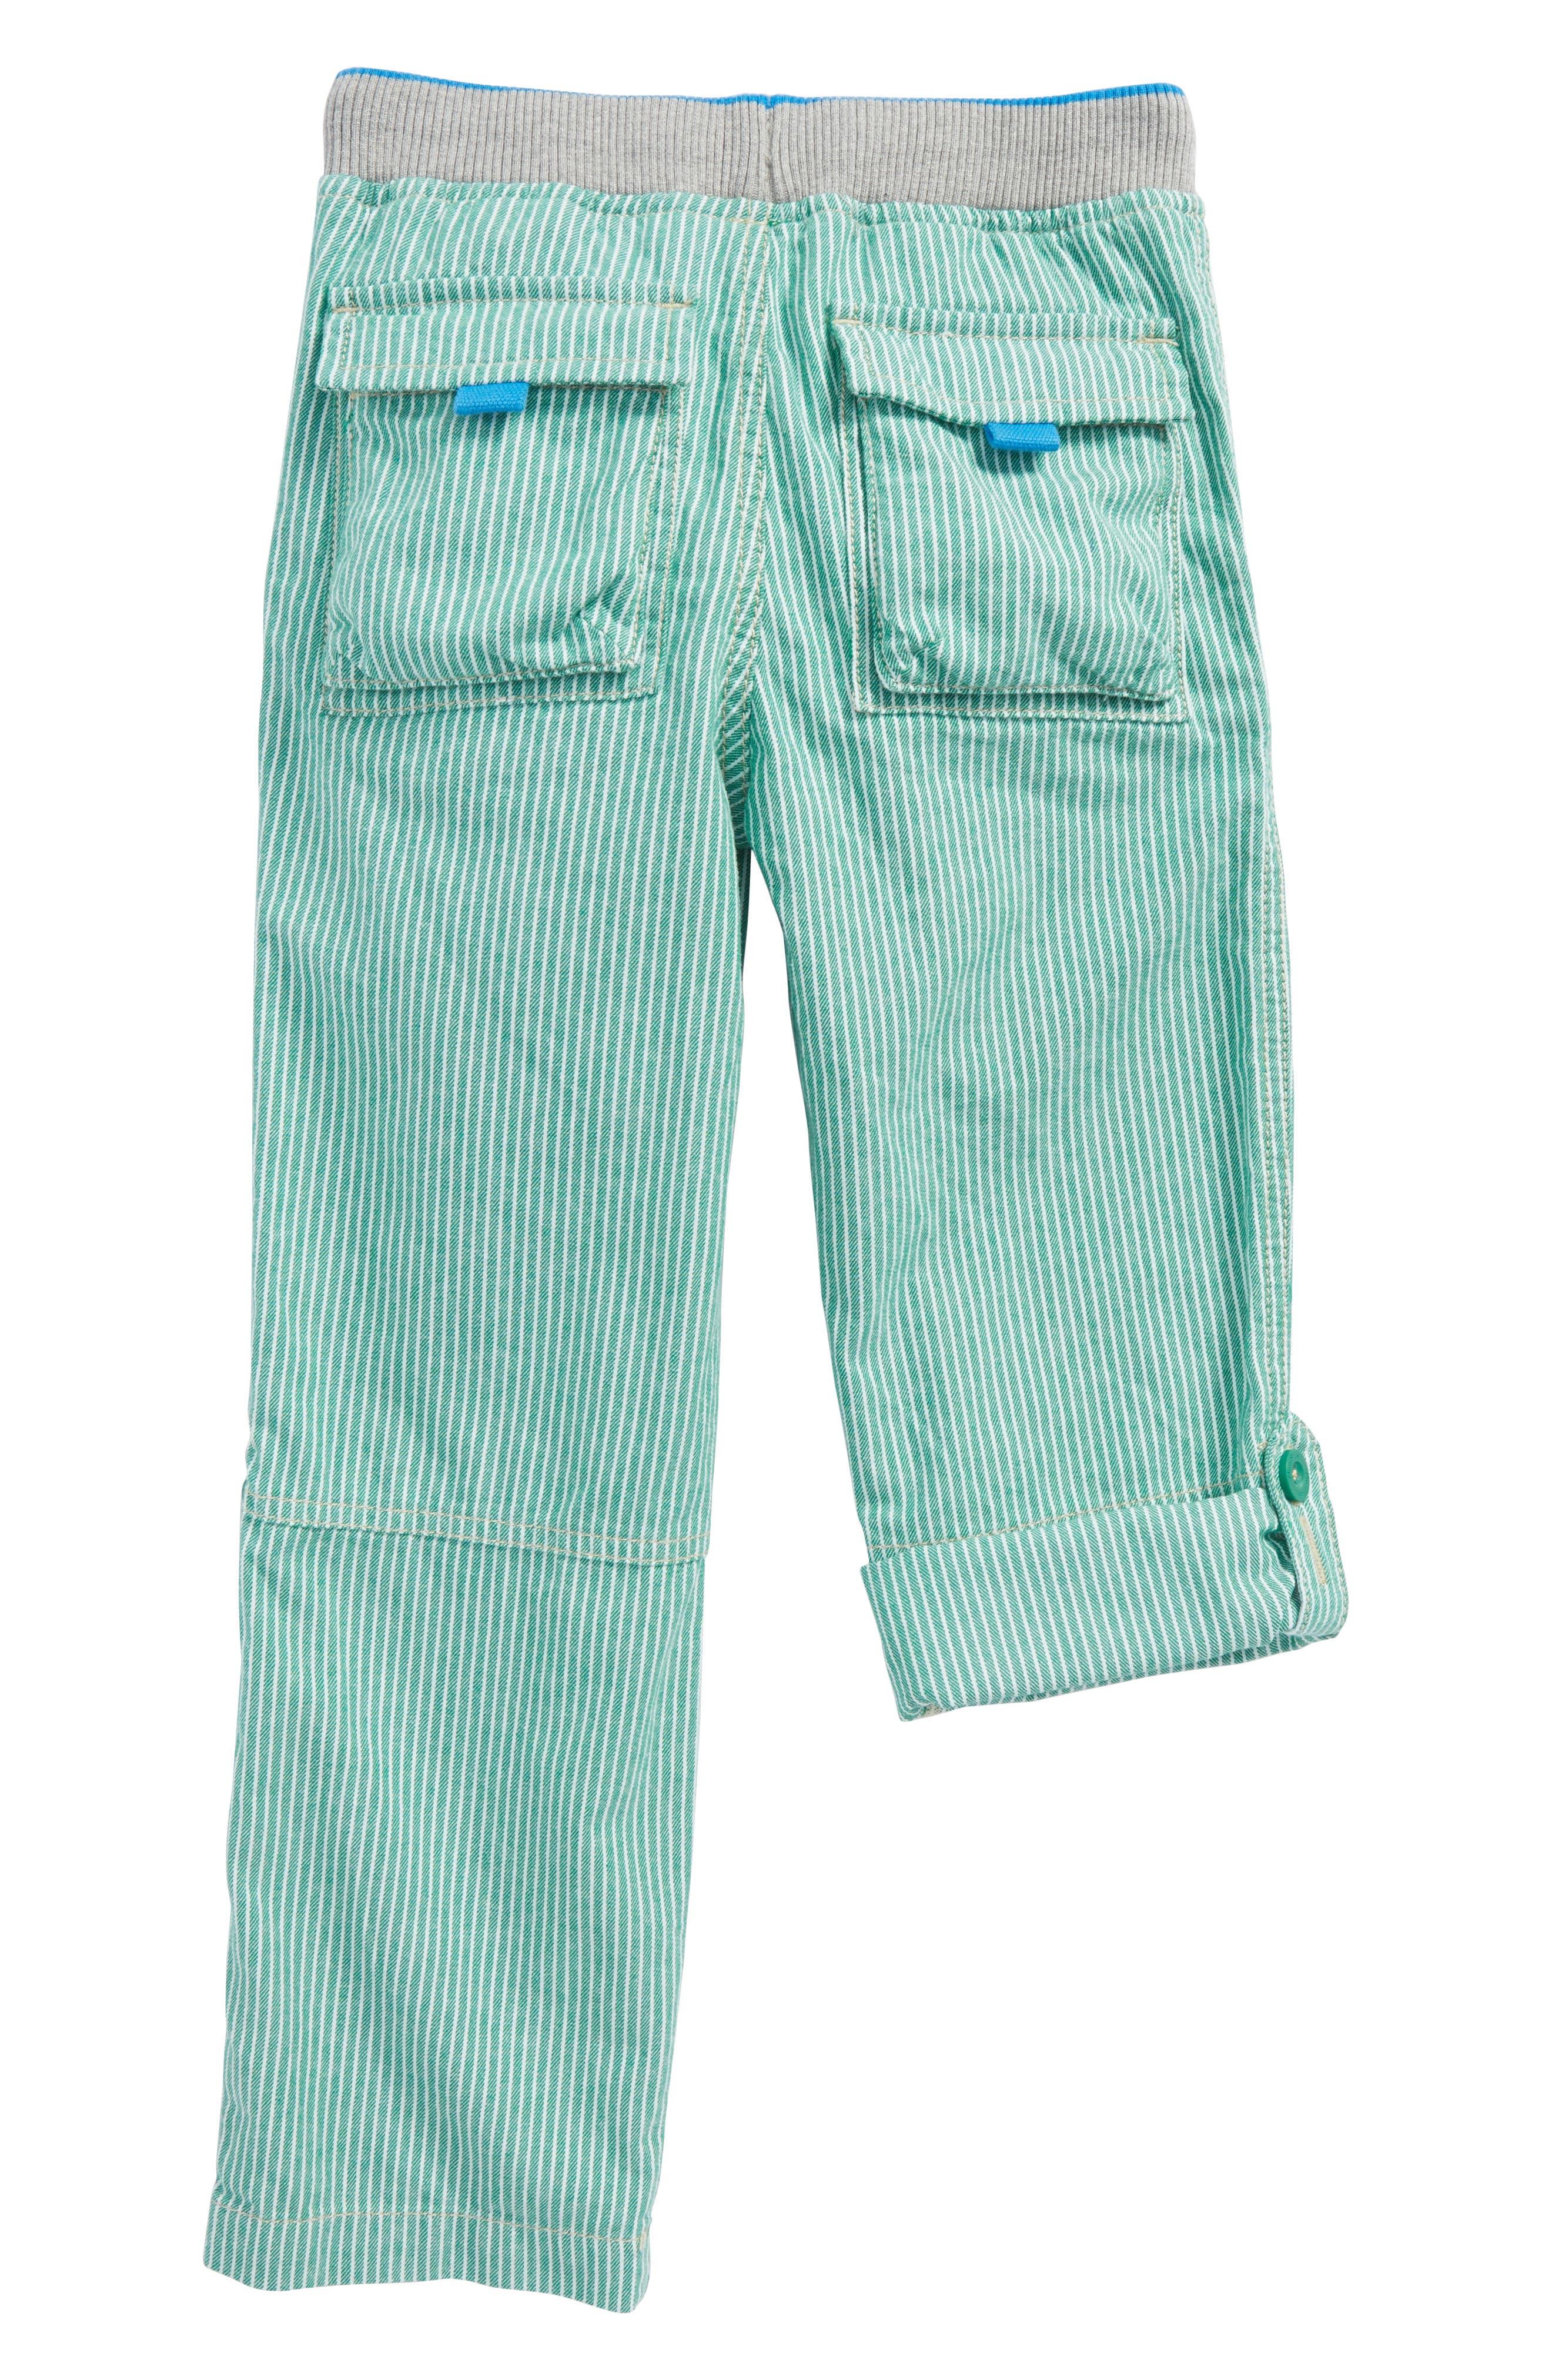 Surf Roll-Up Pants,                             Alternate thumbnail 2, color,                             Moringa Green/ Ecru